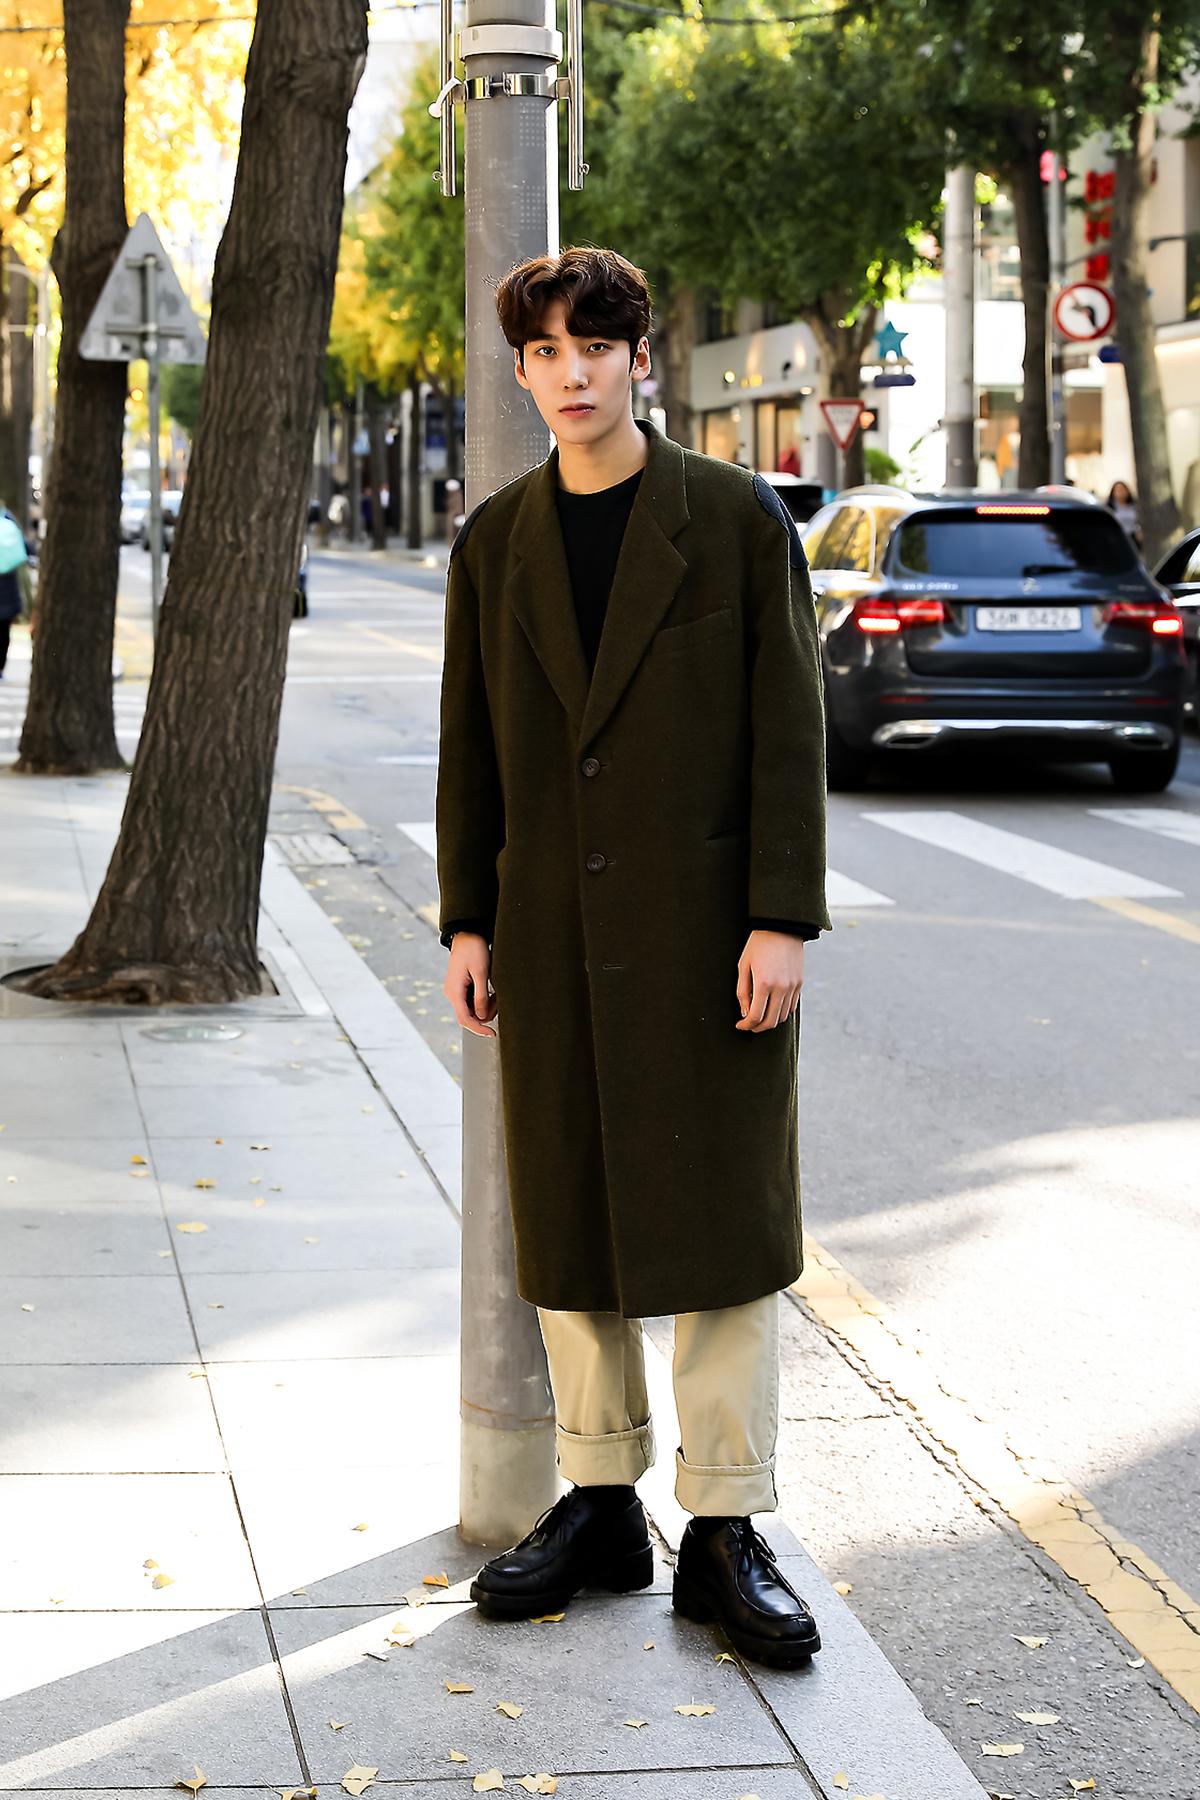 Men fall street style last week of october 2018 inseoul4